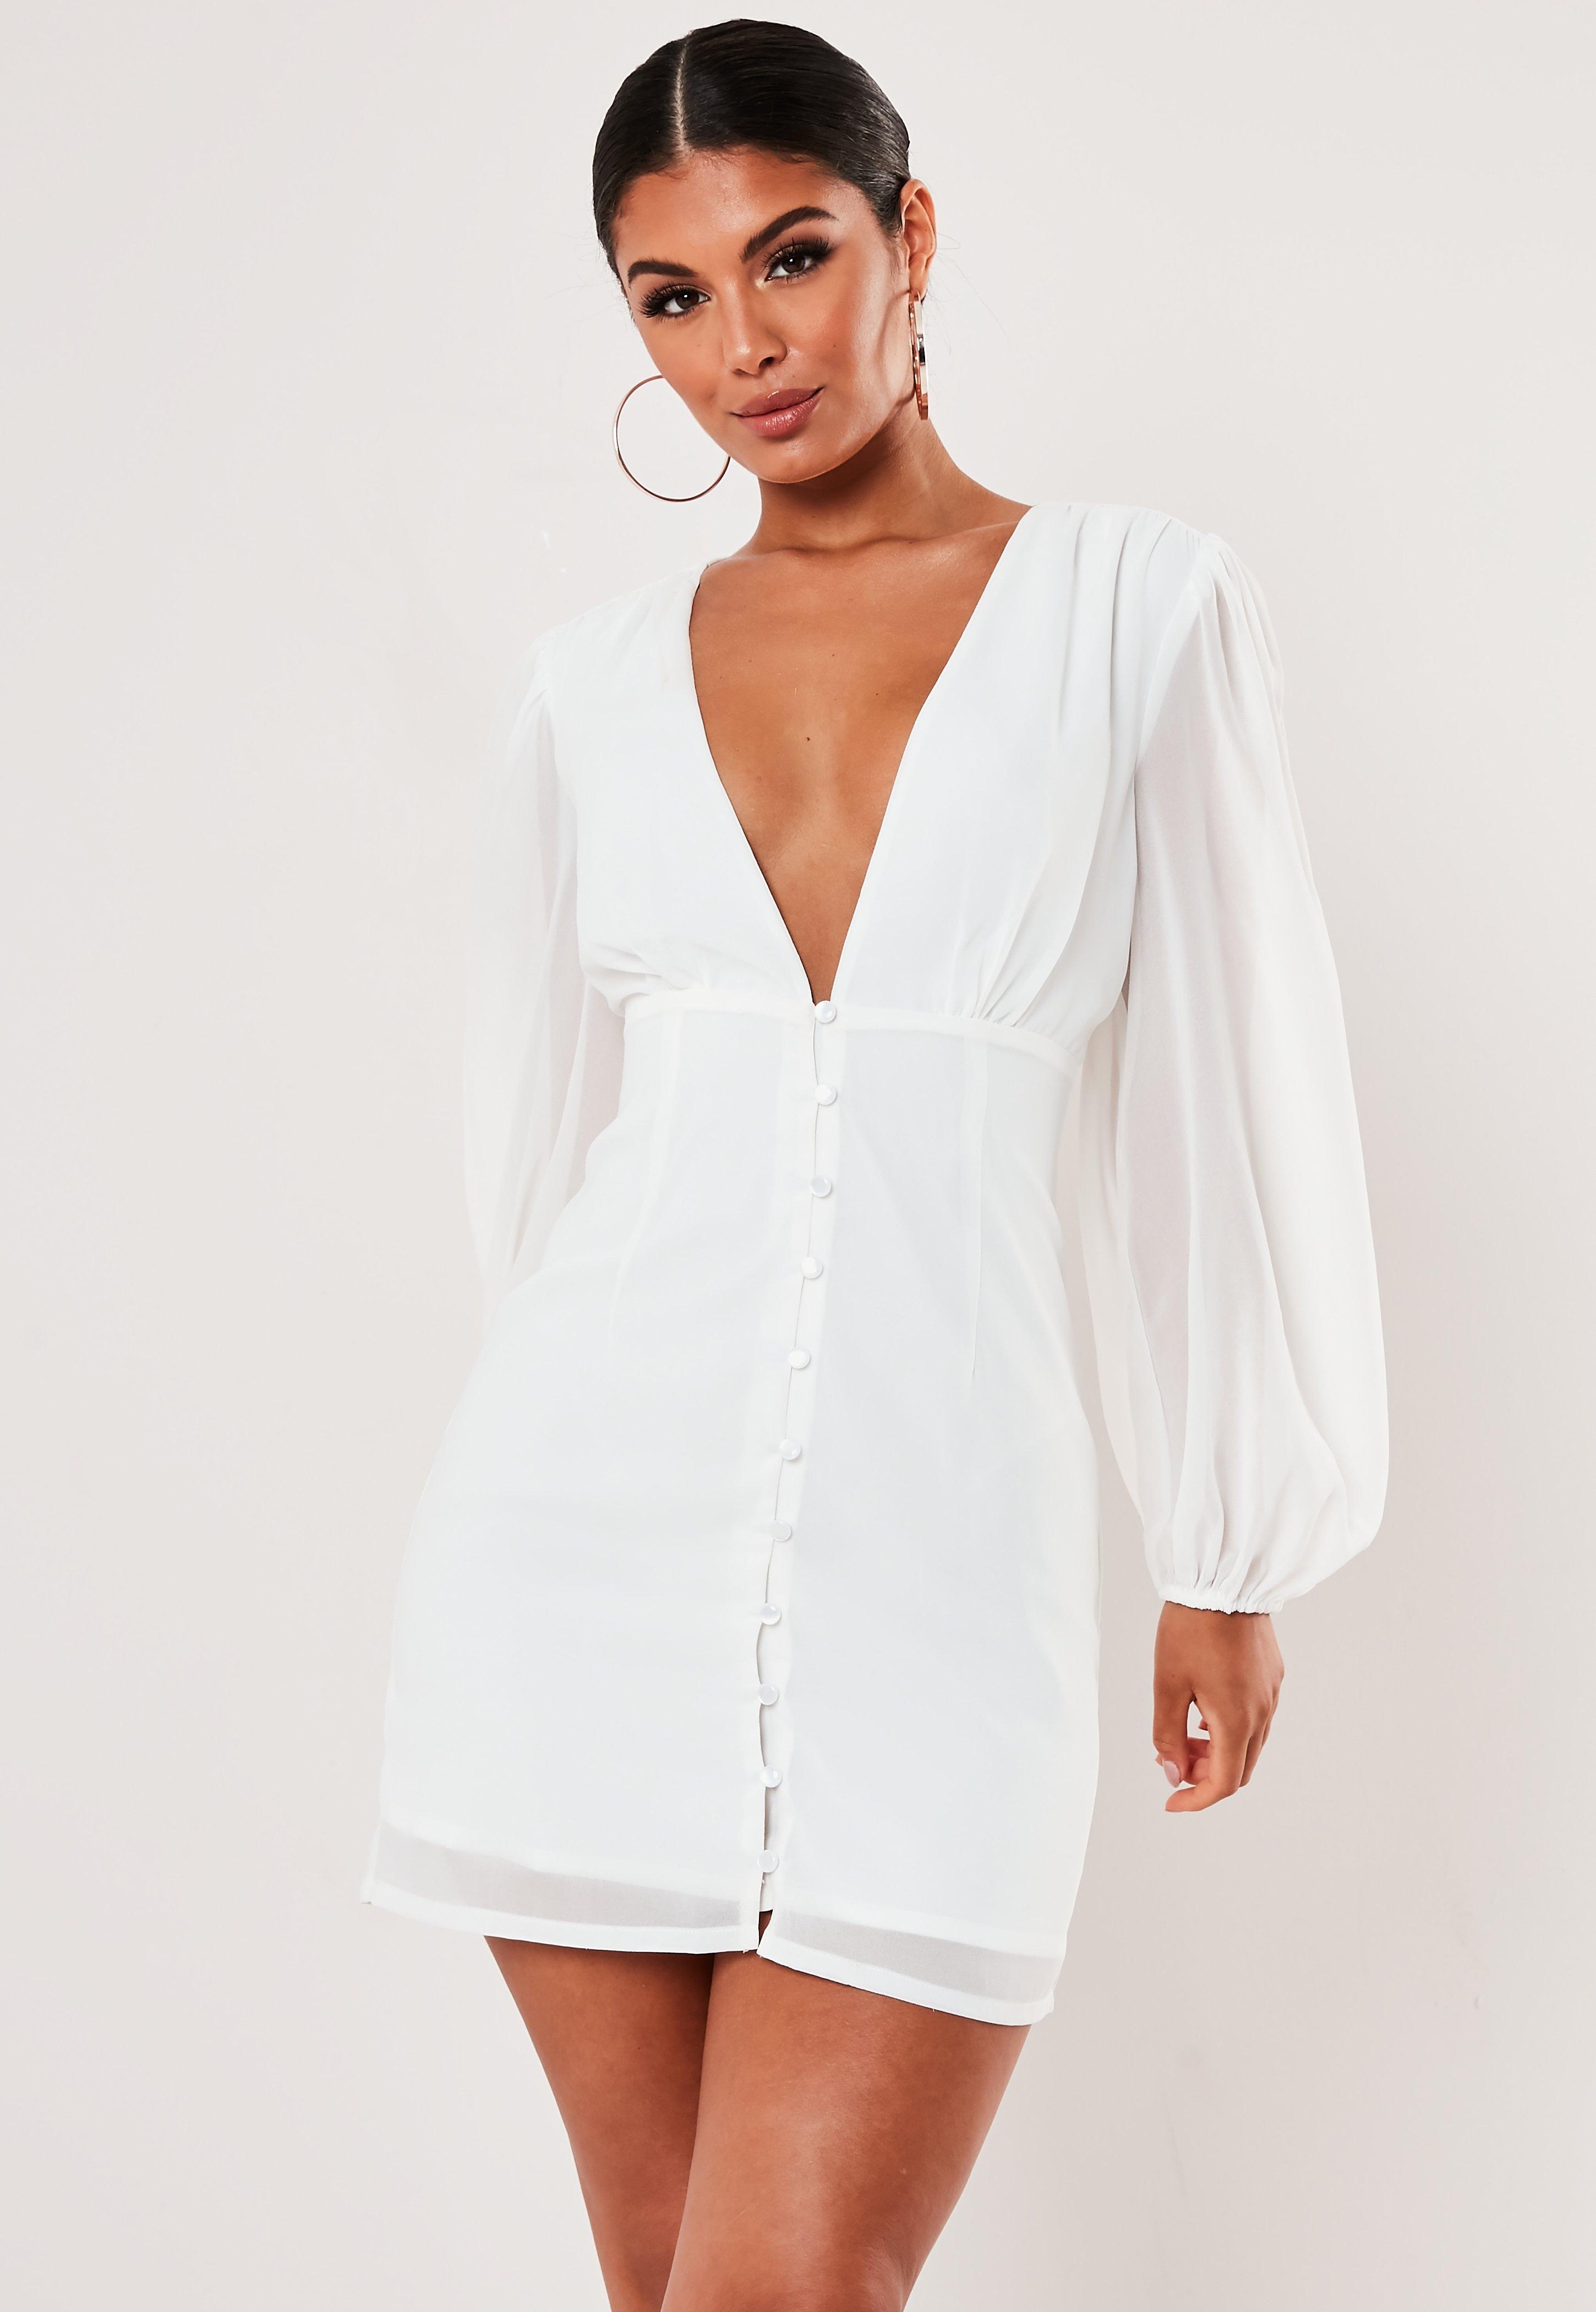 bba866774b1 Chiffon Dresses Online   Missguided